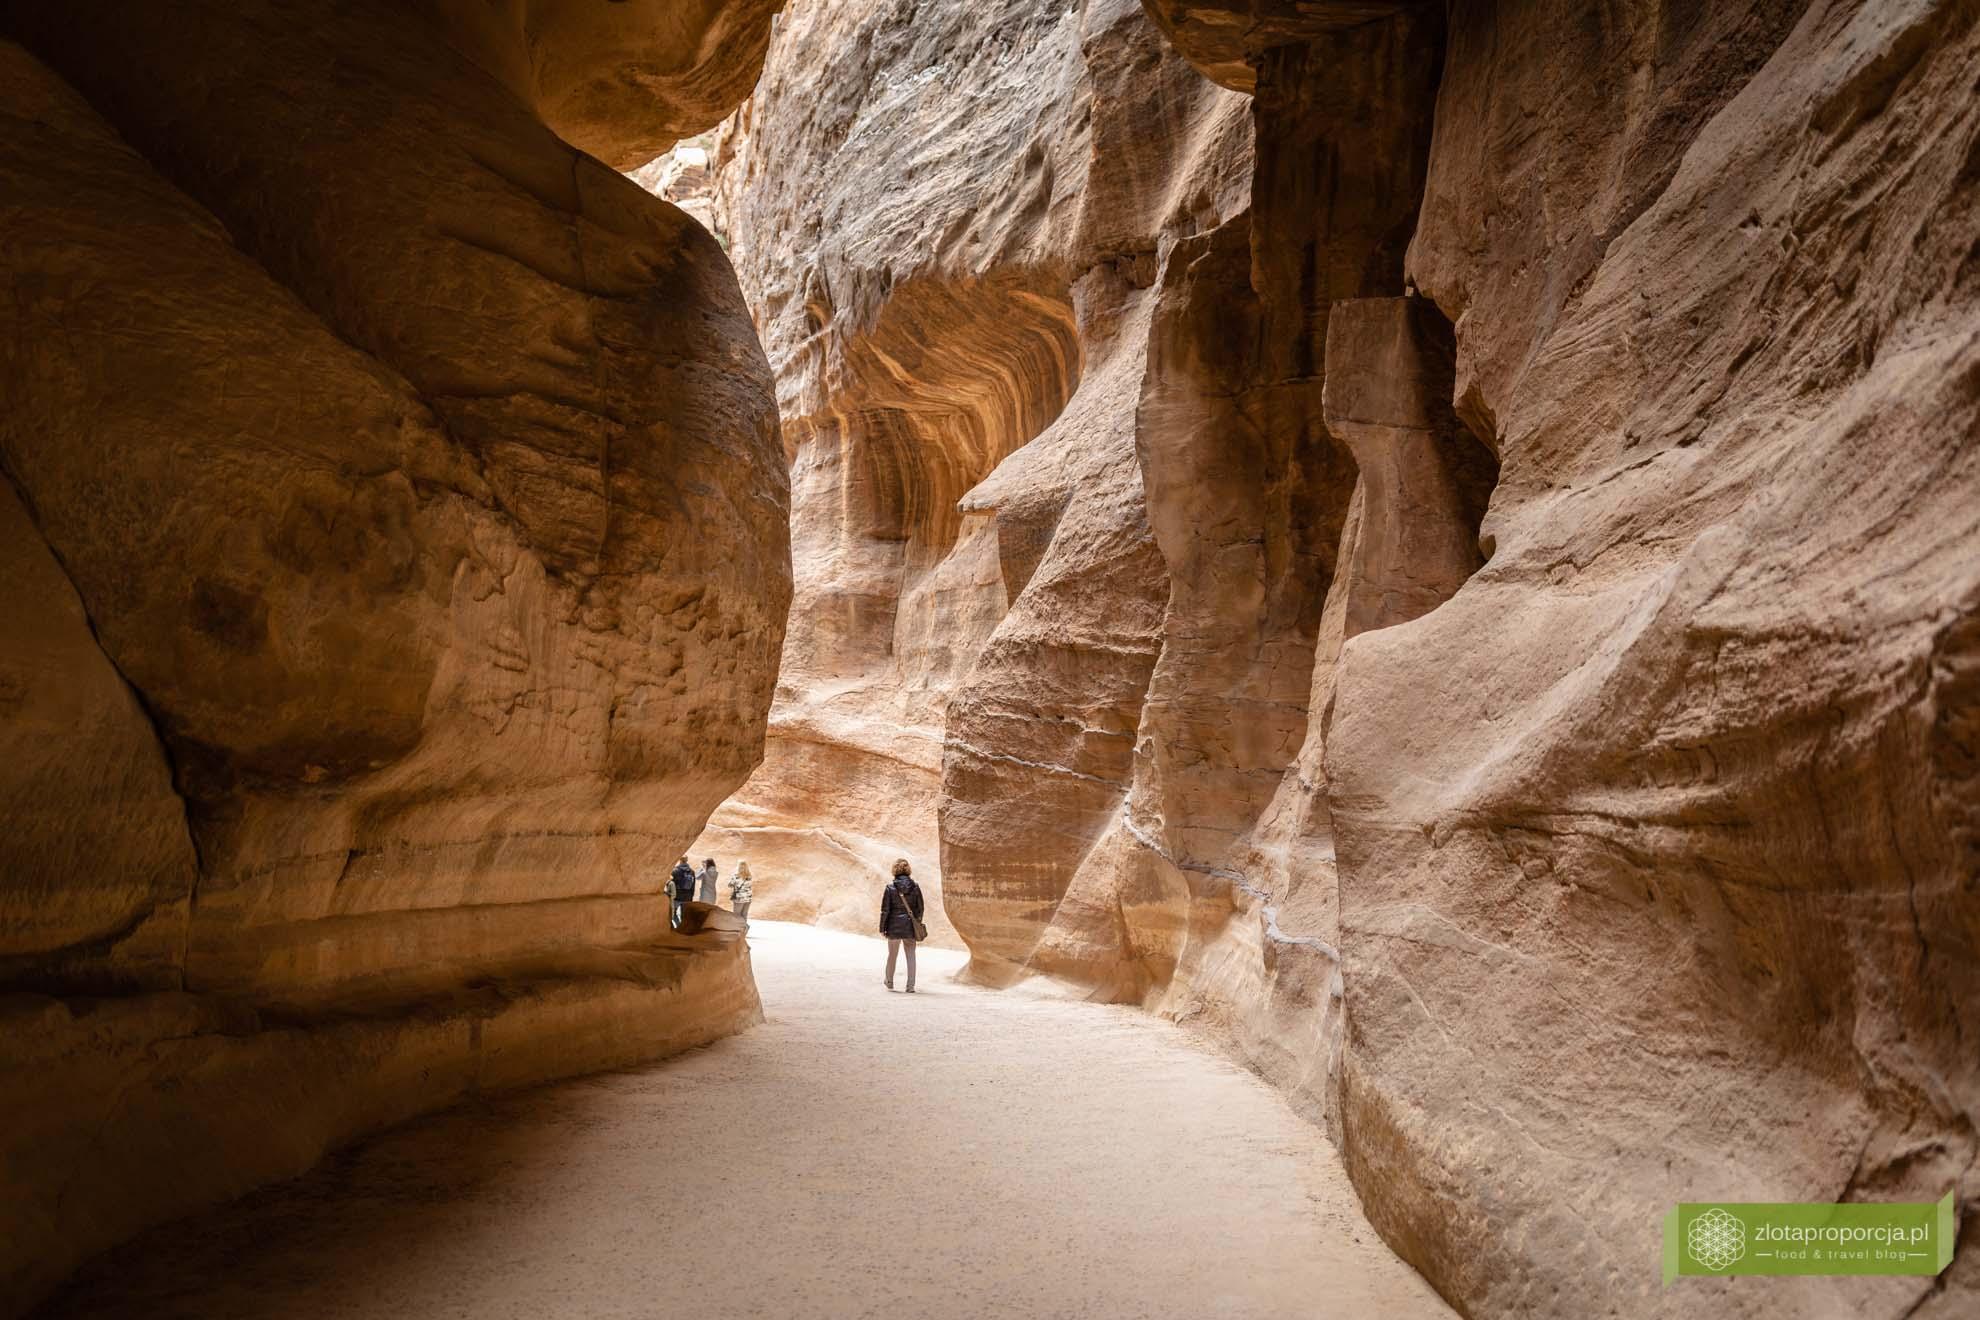 Petra; Jordania; atrakcje Petry; miasto wykute w skale; Petra Jordania; Petra cud świata; miasto Nabatejczyków; Wąwóz Bab As-Sik; Wąwóz Petra; As Siq;